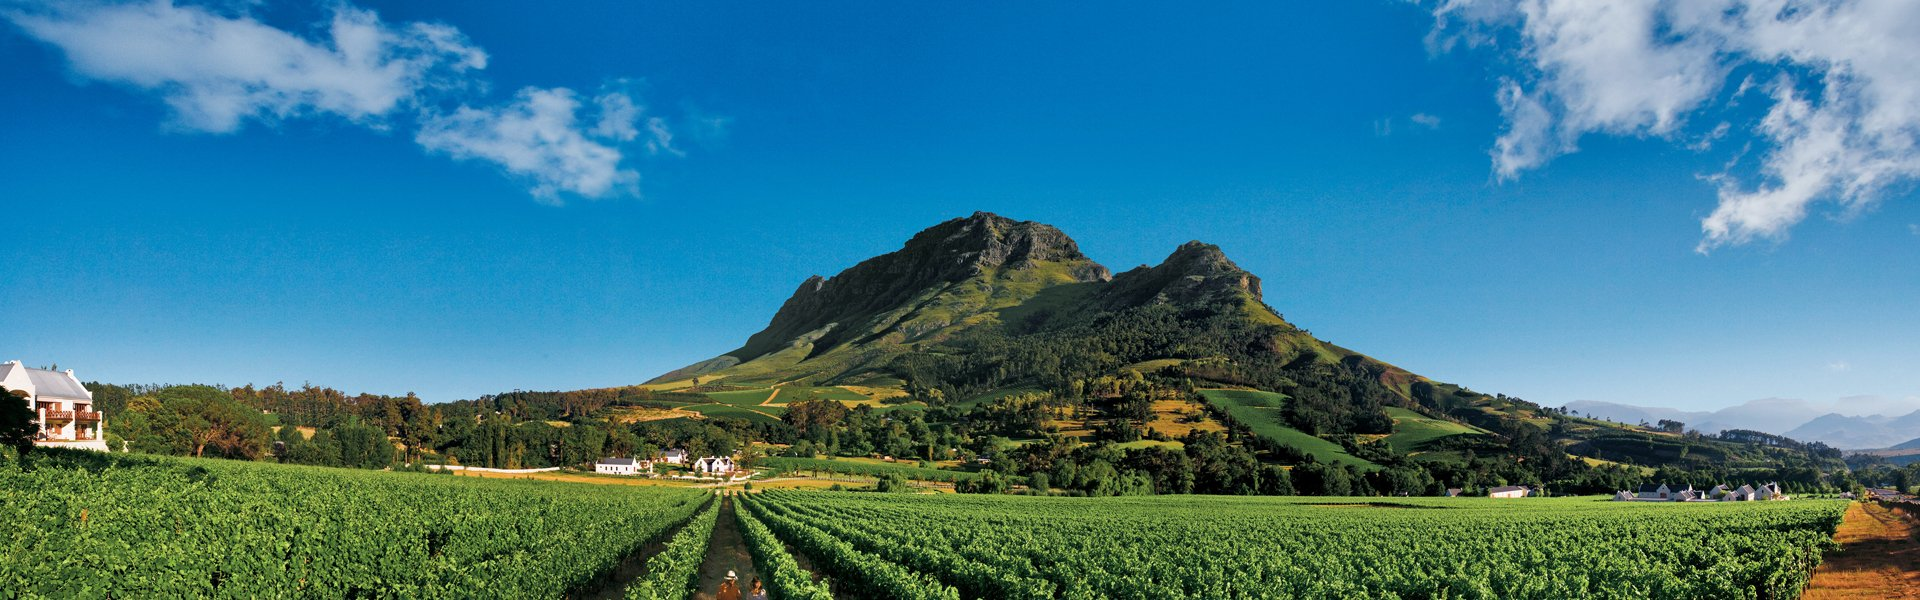 Stellenbosch in Zuid-Afrika